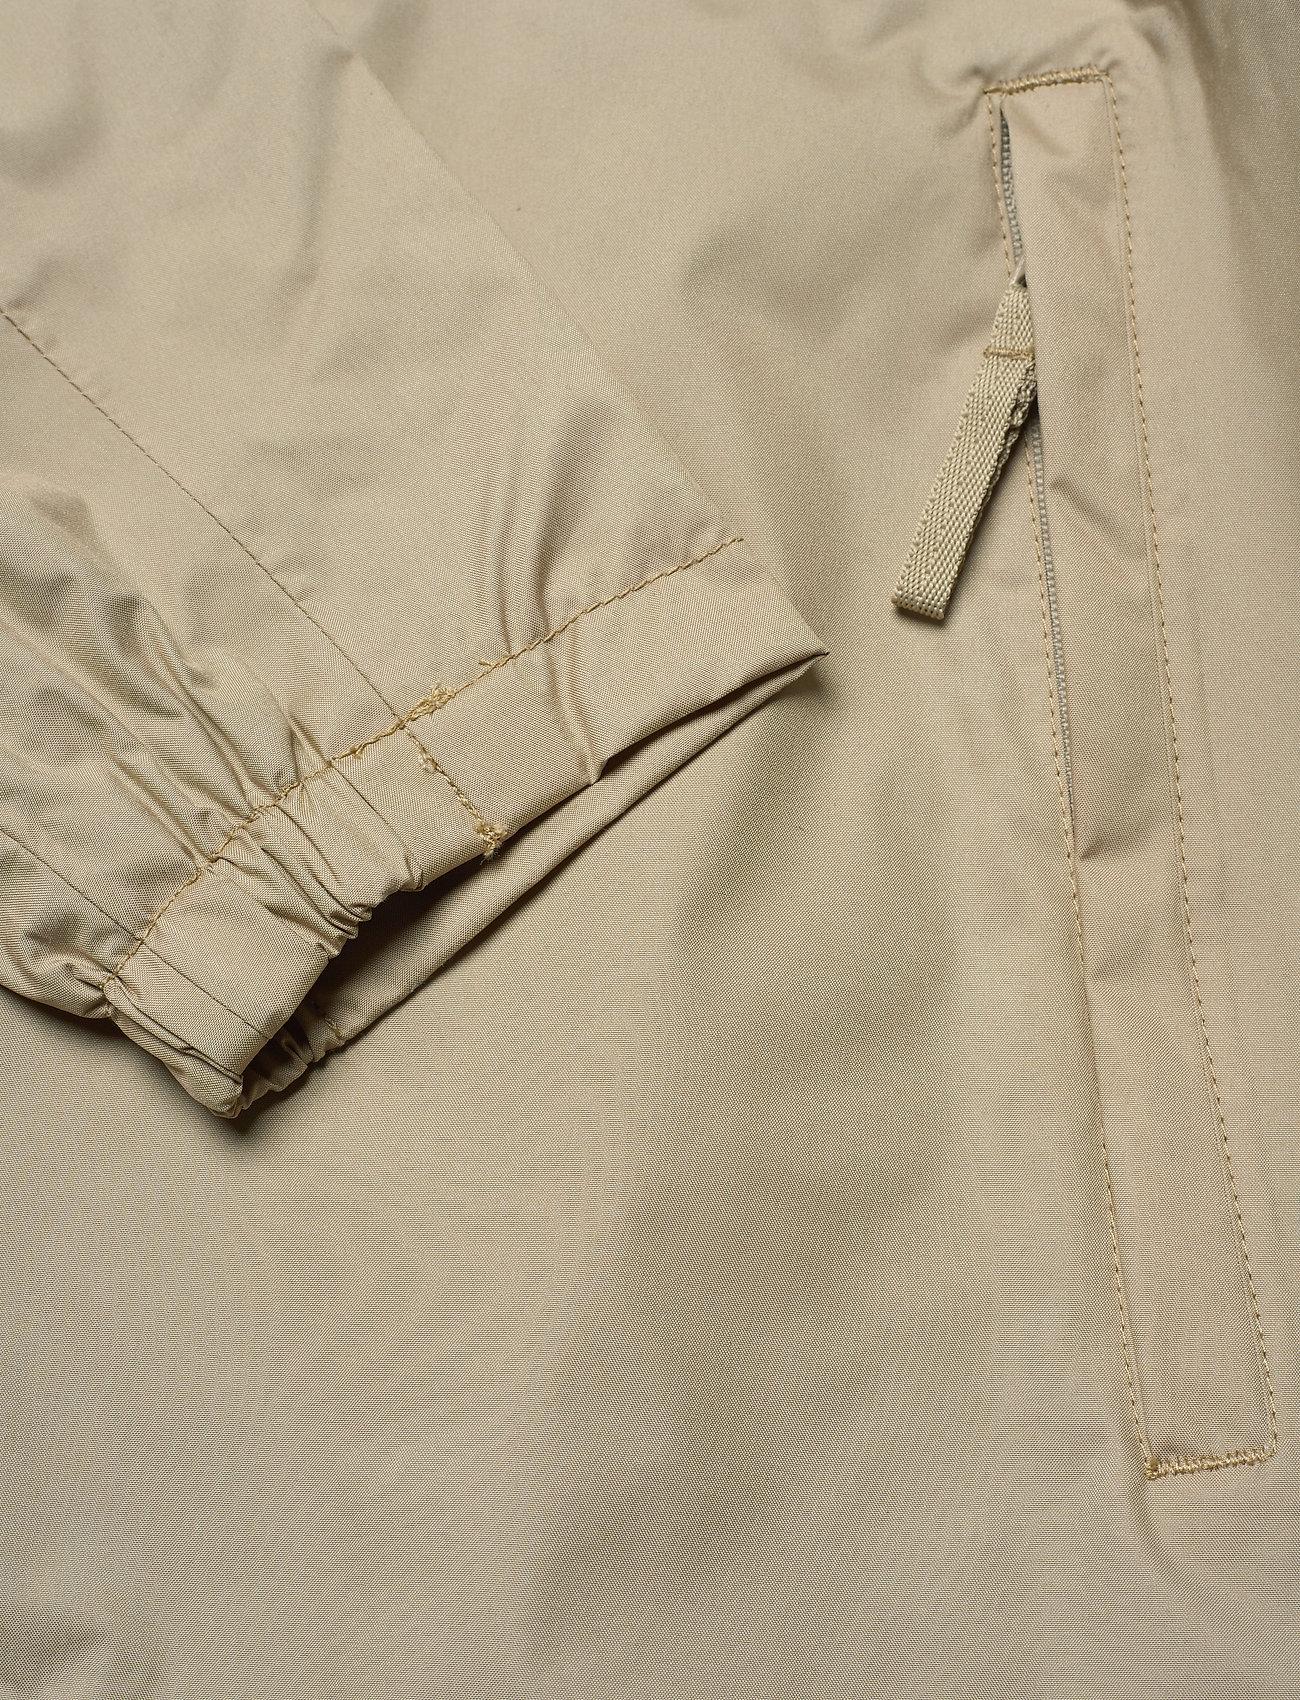 Helly Hansen Amaze Jacket - Jackor & Rockar Forest Night